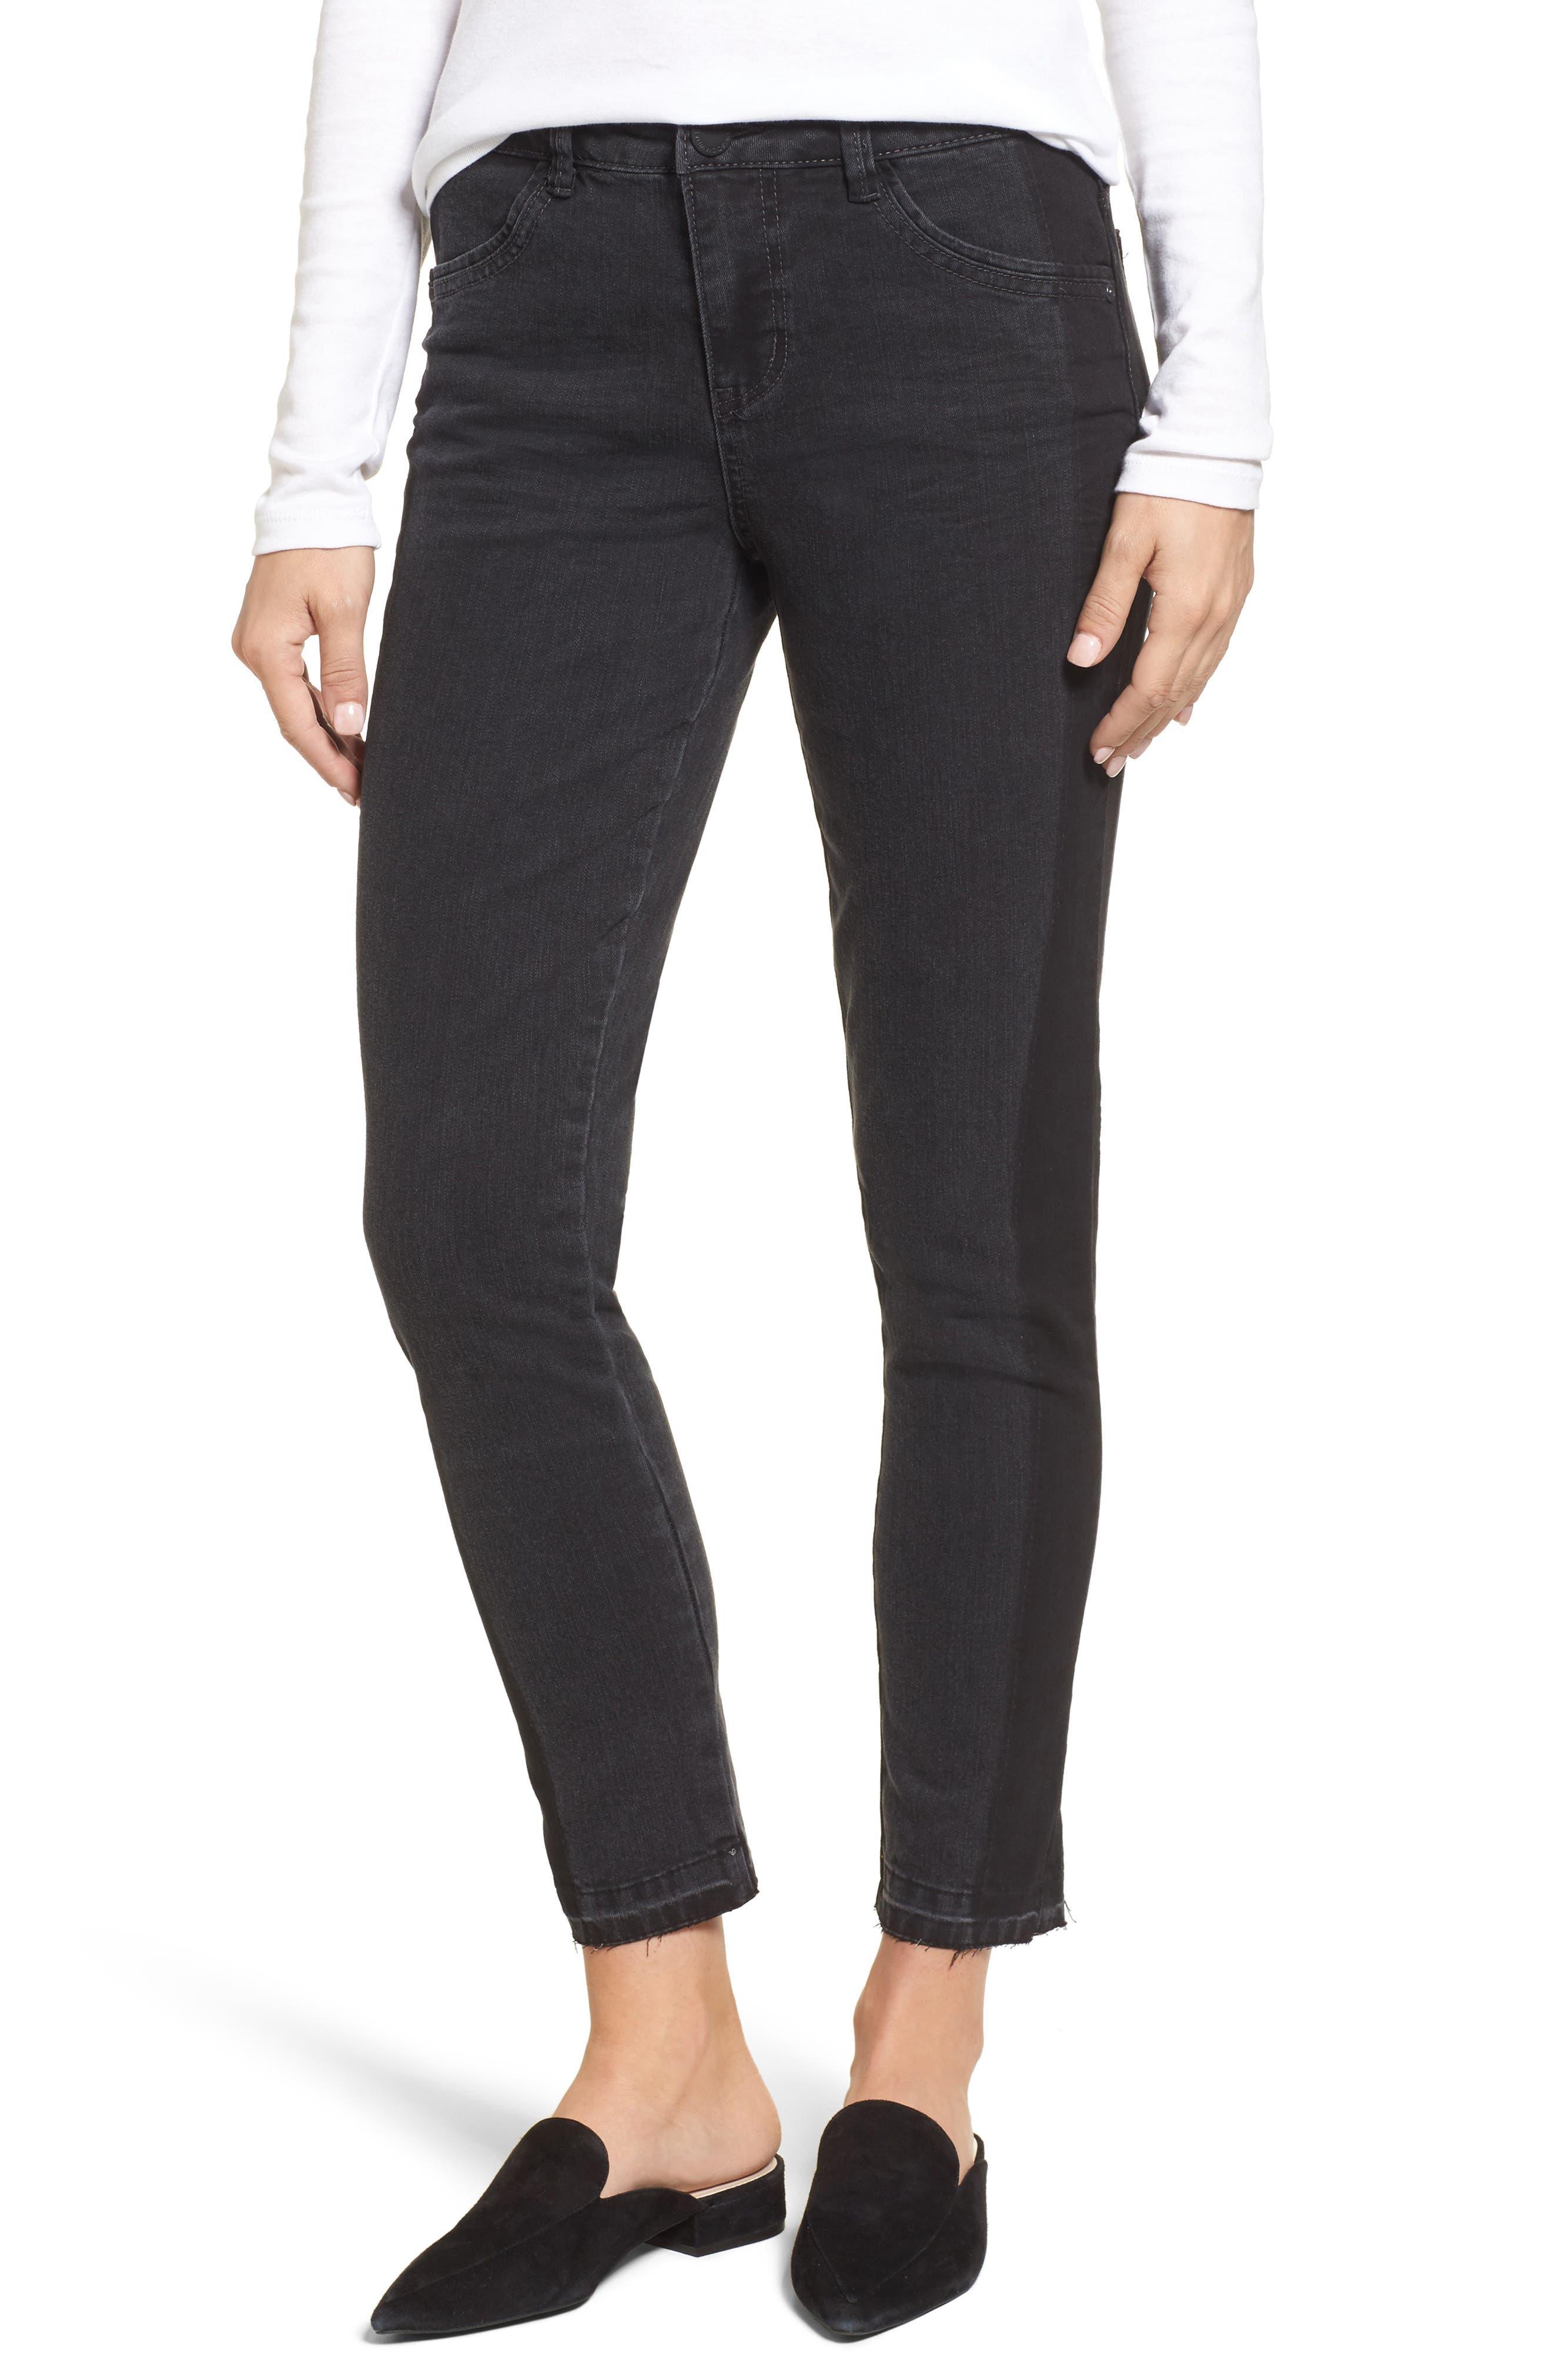 Main Image - Wit & Wisdom Tuxedo Stripe Skinny Jeans (Nordstrom Exclusive) (Regular & Petite)